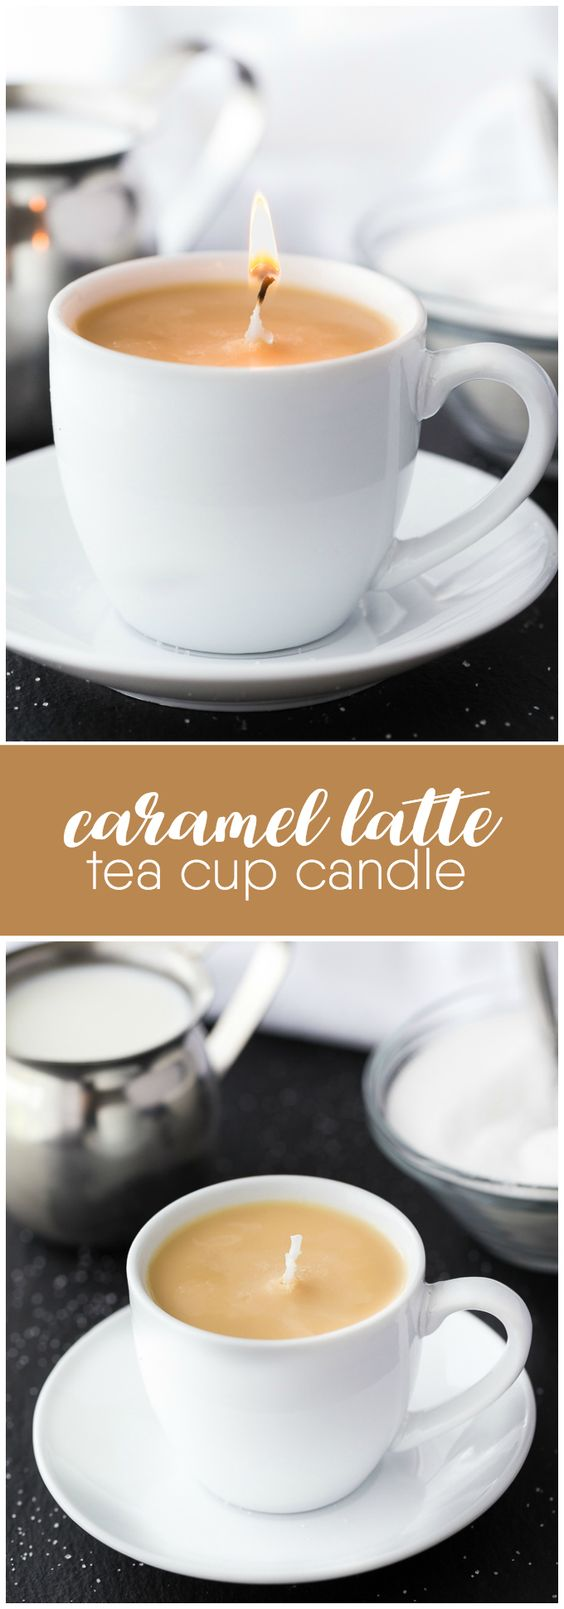 Caramel Latte Tea Cup Candle.